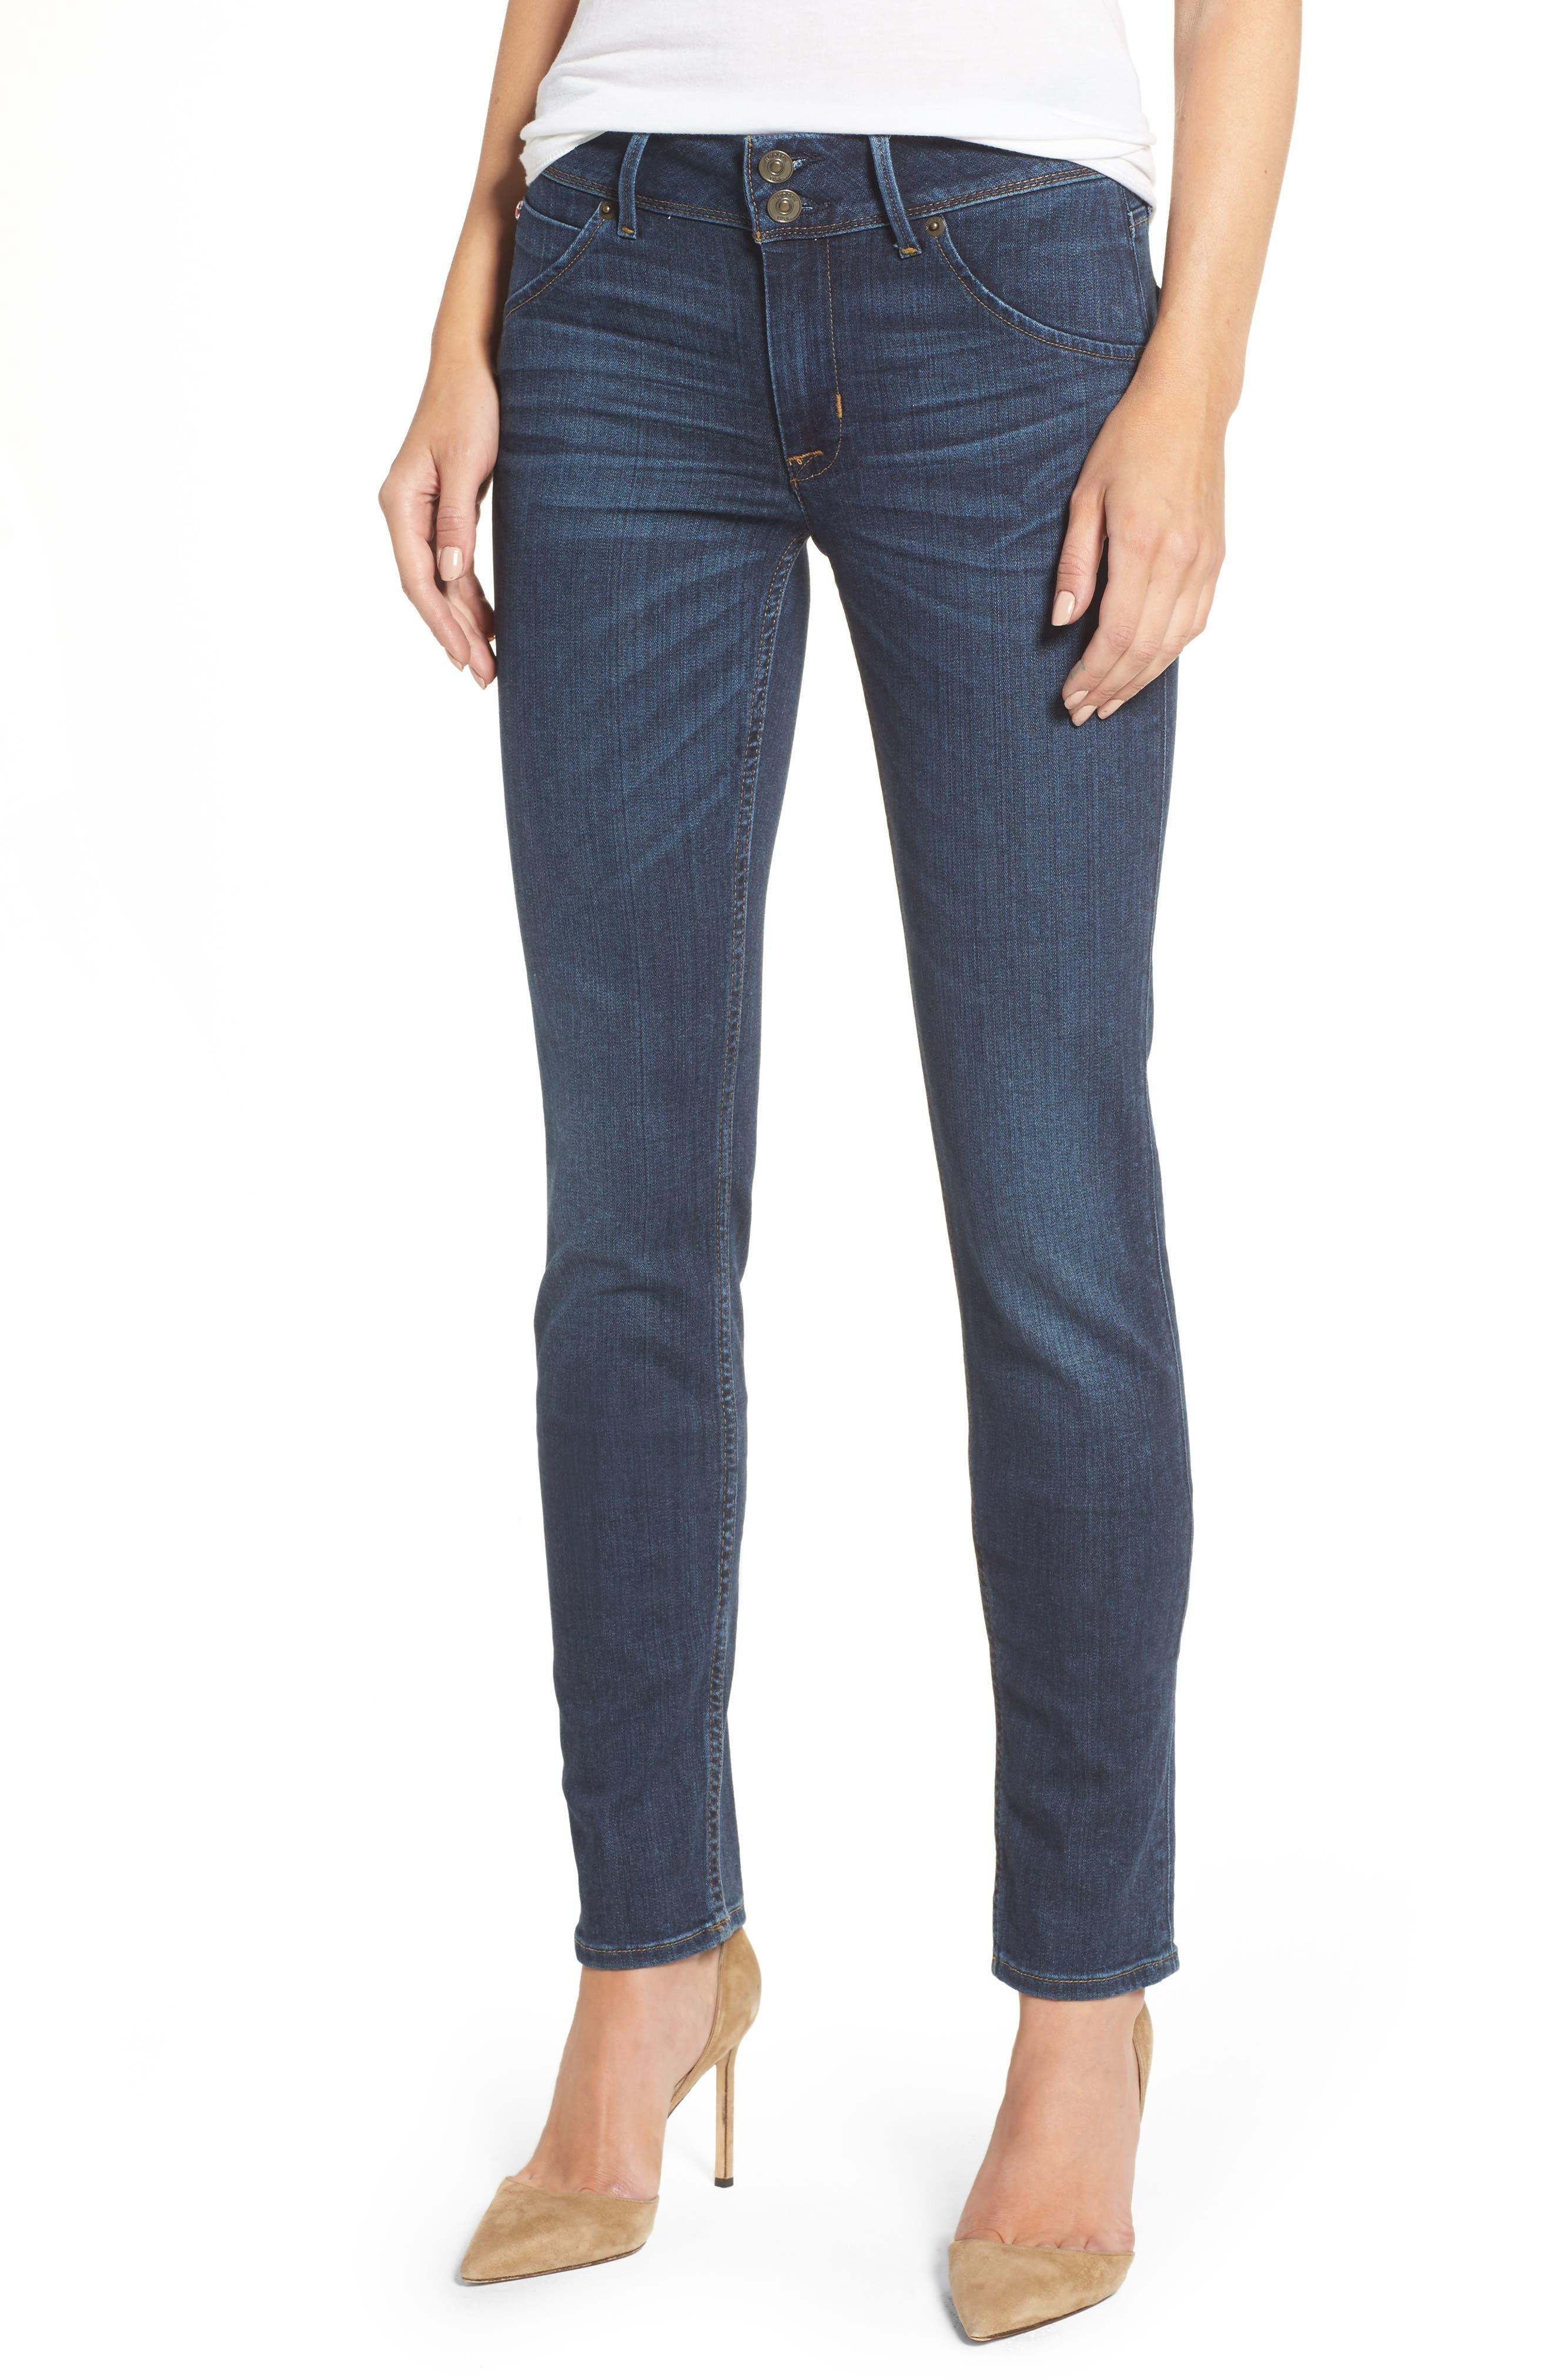 Collin Supermodel Skinny Jeans,                             Main thumbnail 1, color,                             422